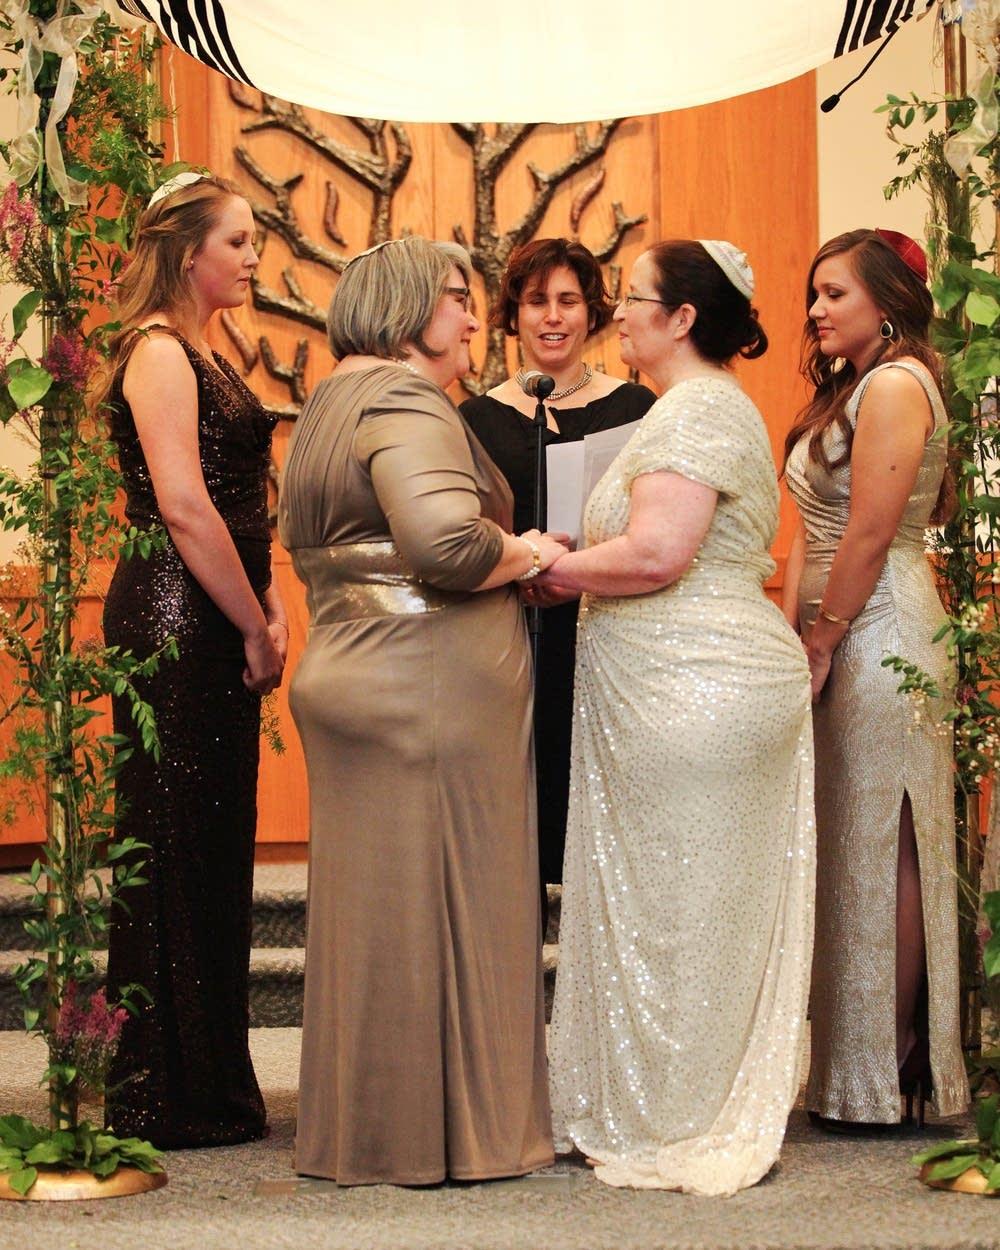 Same-sex couples making new wedding rituals  MPR News